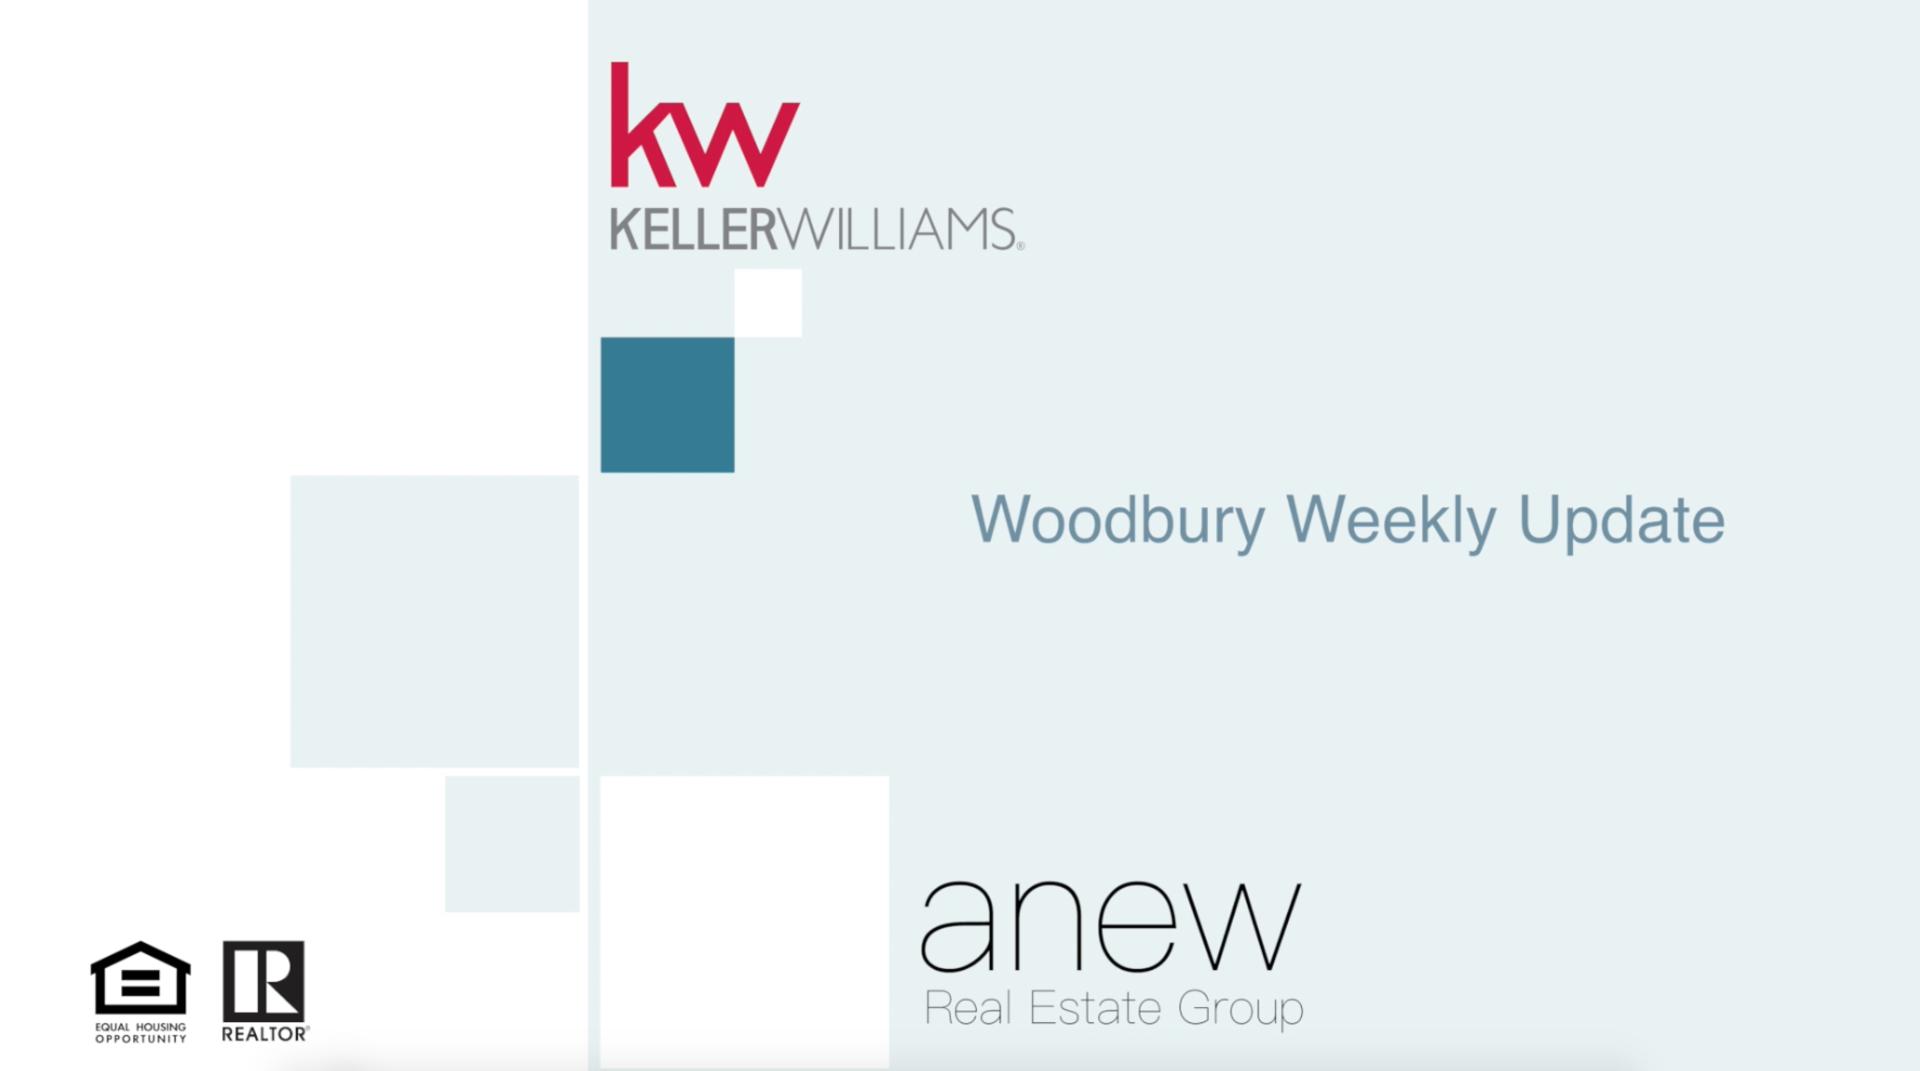 Woodbury Weekly Update for June 25th